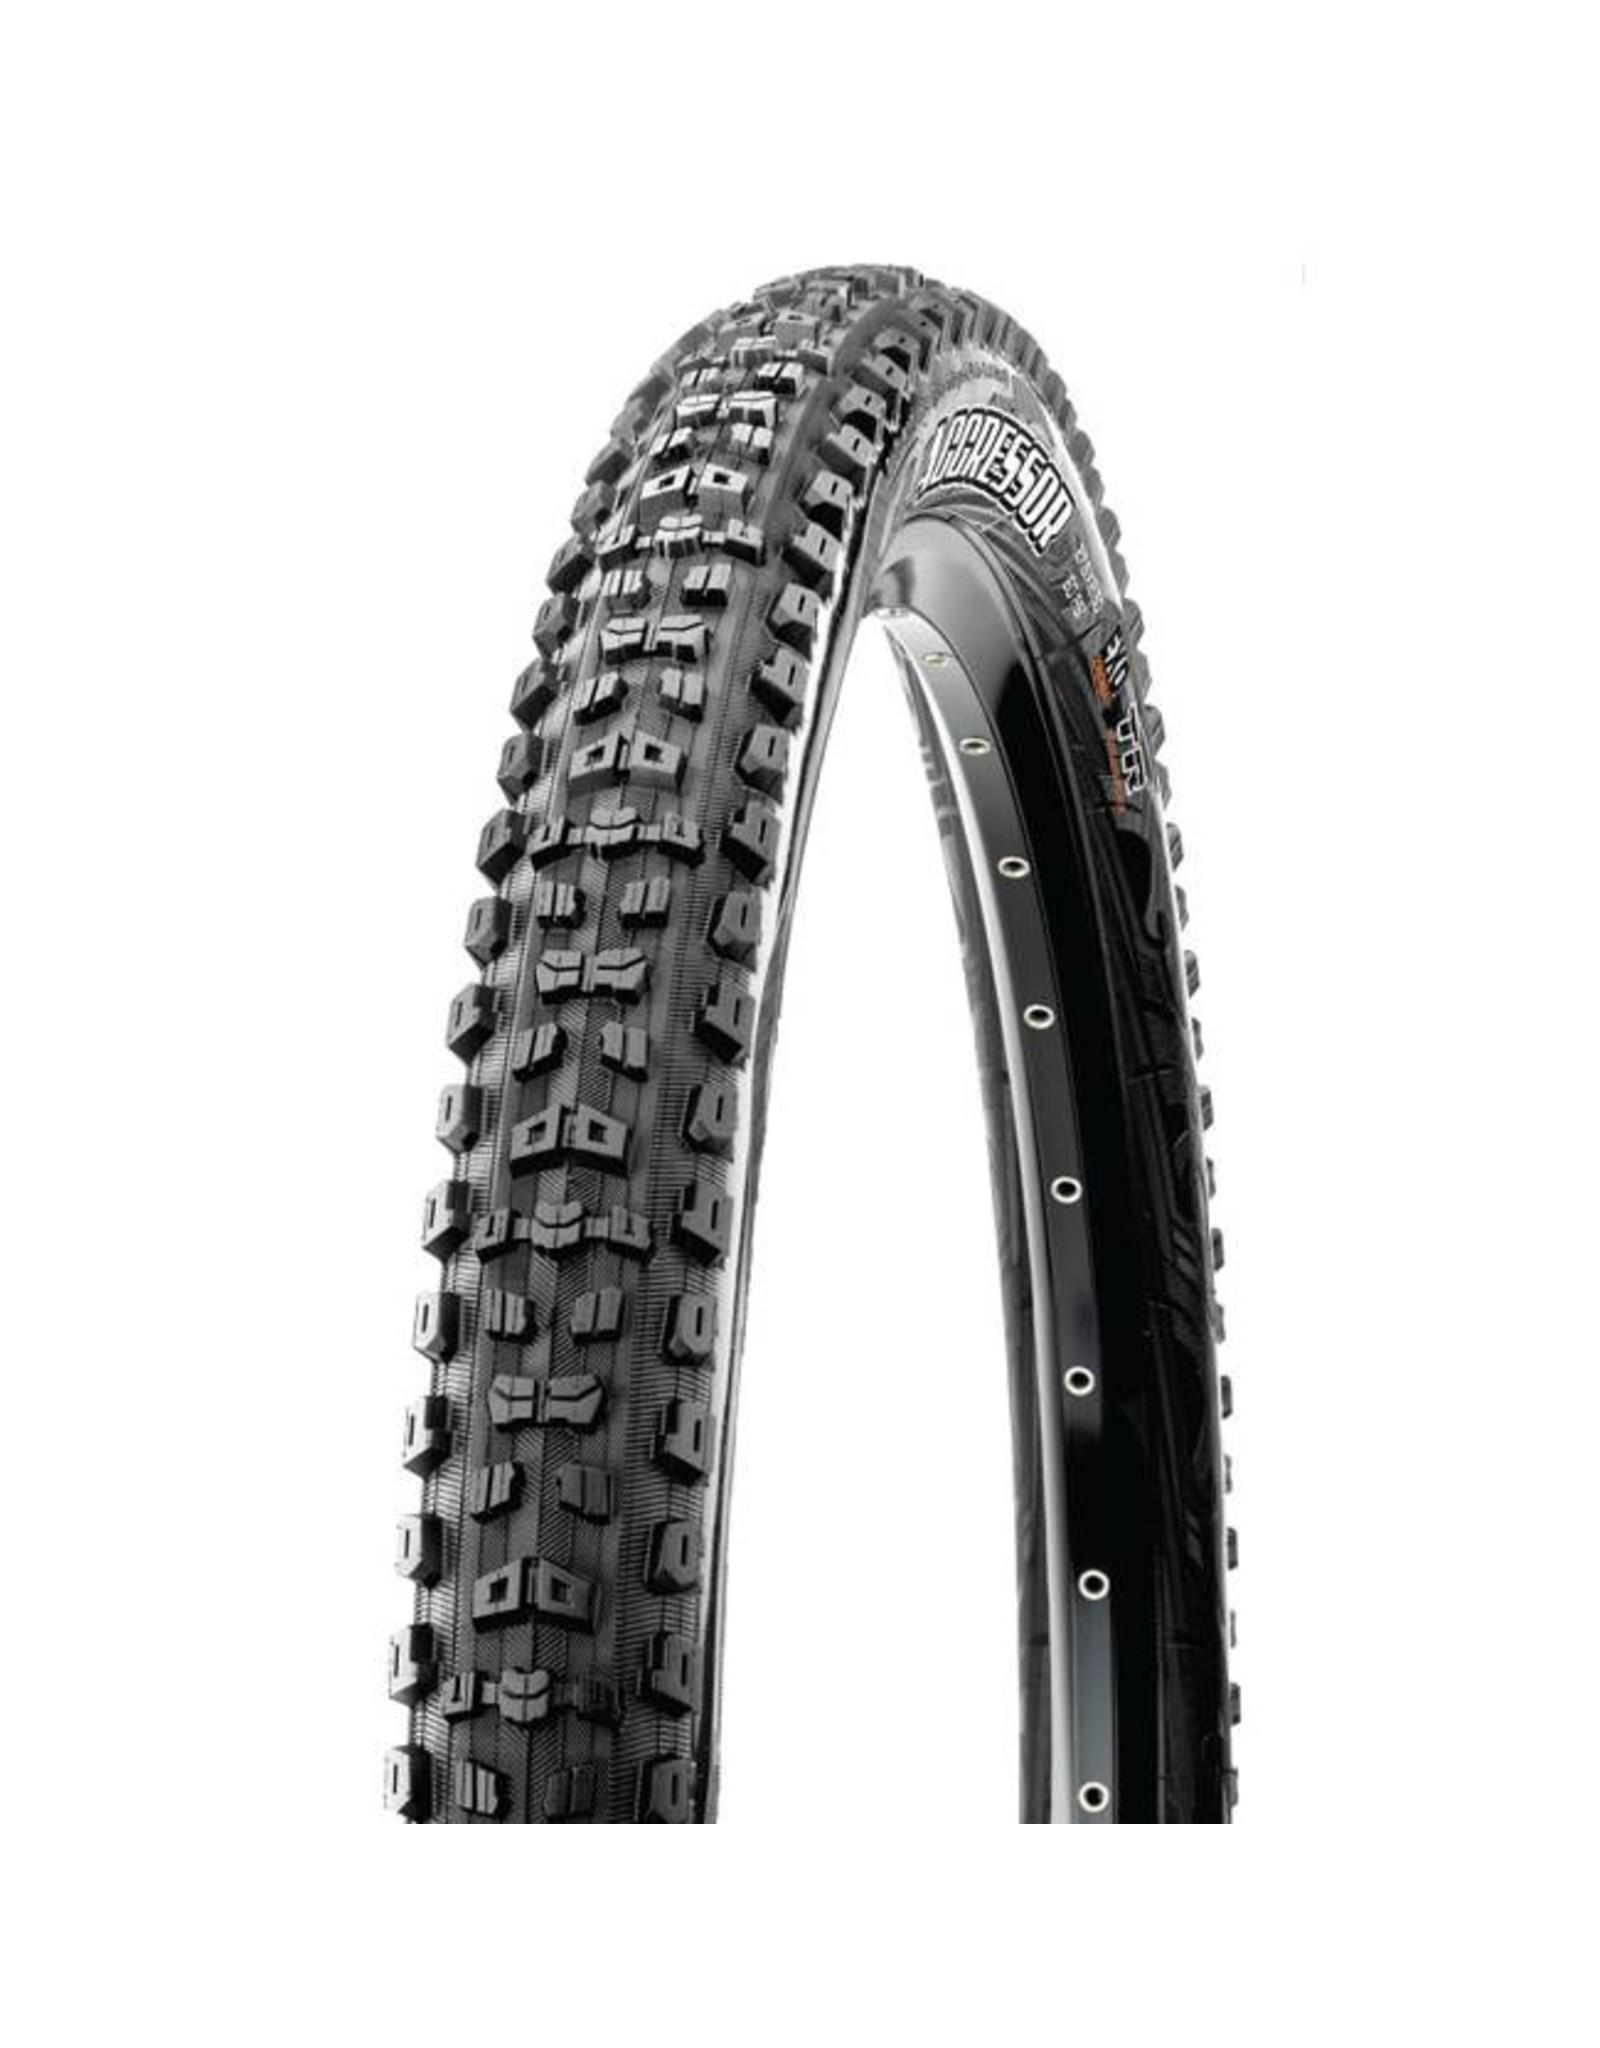 "Maxxis Maxxis Aggressor Tire: 27.5 x 2.30"", Folding, 60tpi, Dual Compound, EXO, Tubeless Ready, Black"